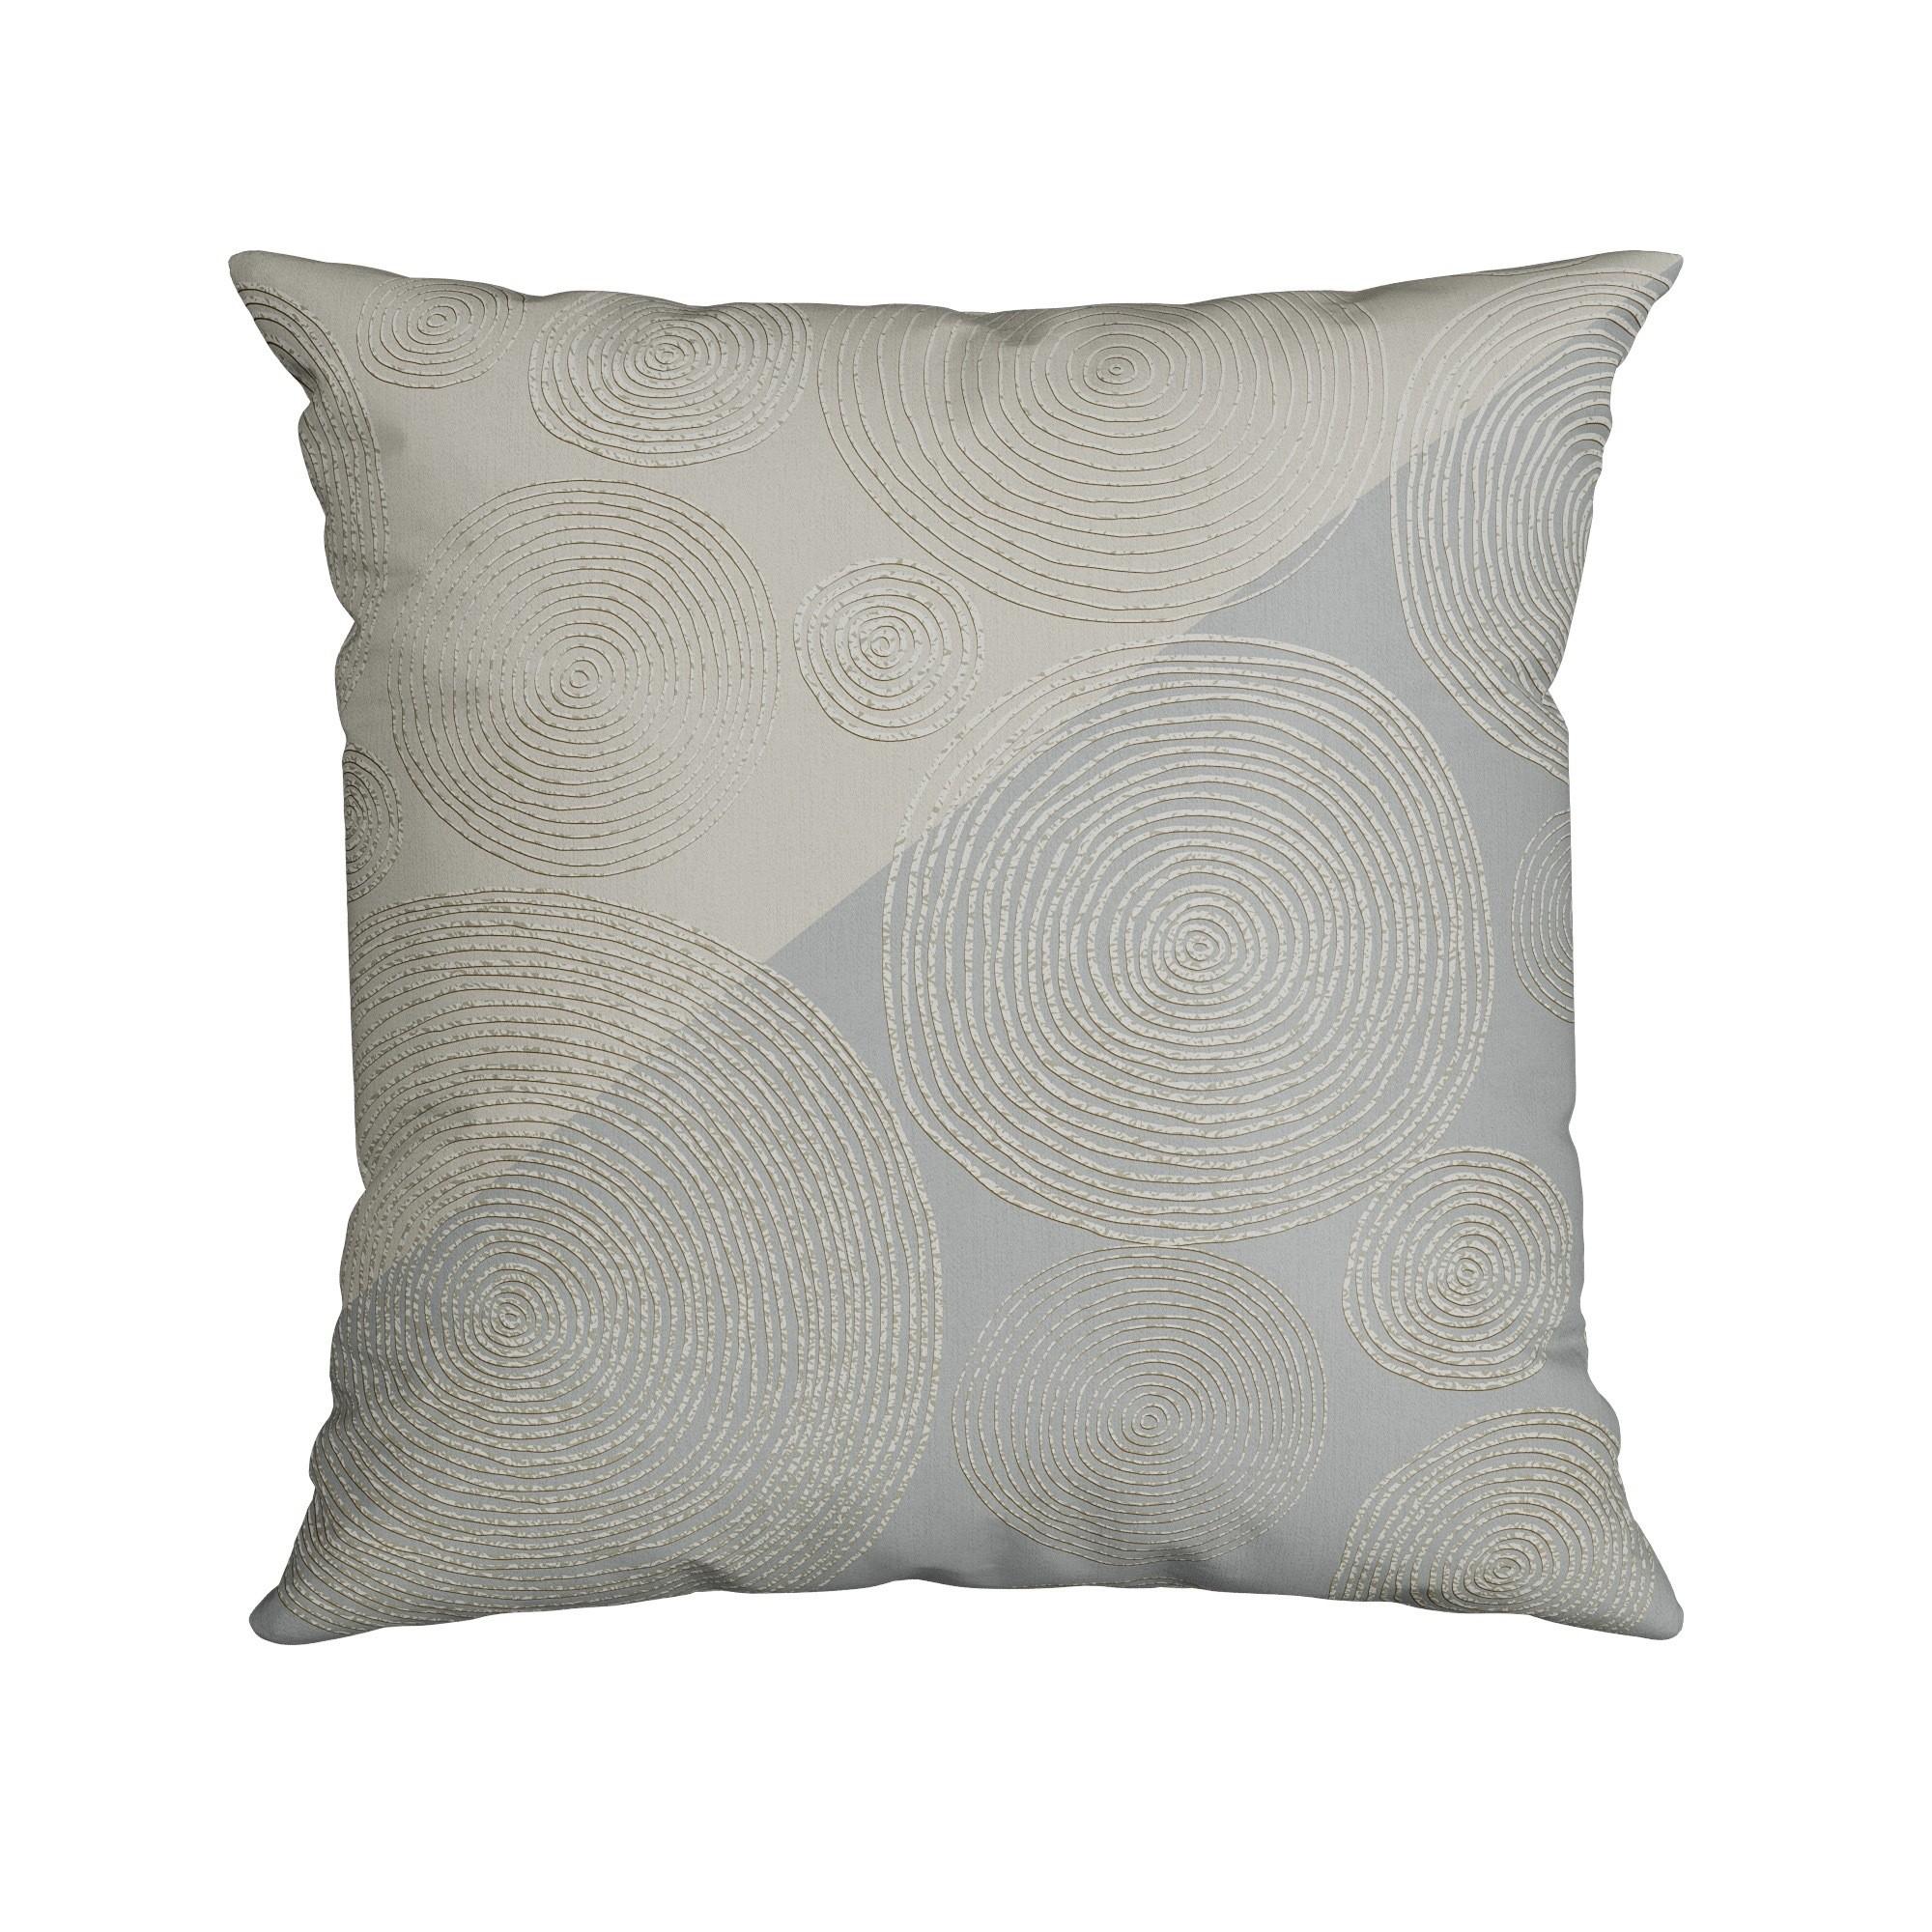 Almofada Silk Home 50x50cm 0497 - Belchior